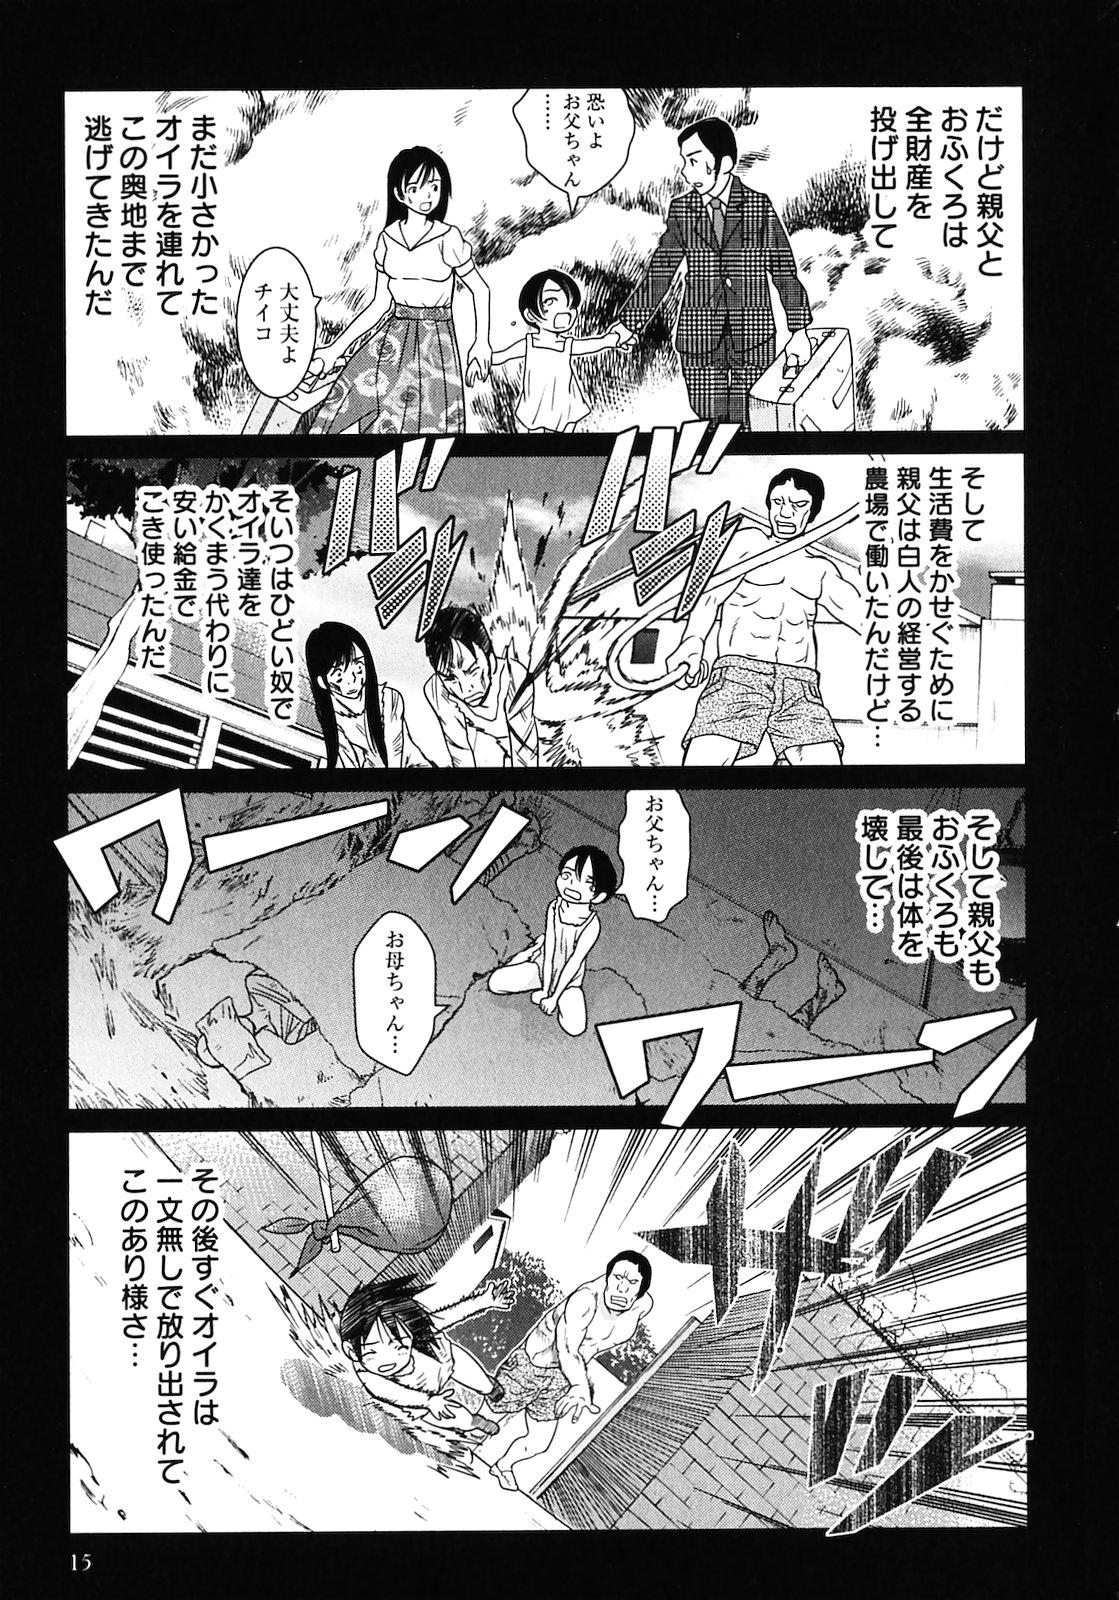 Makyo no Shanana Vol.02 16